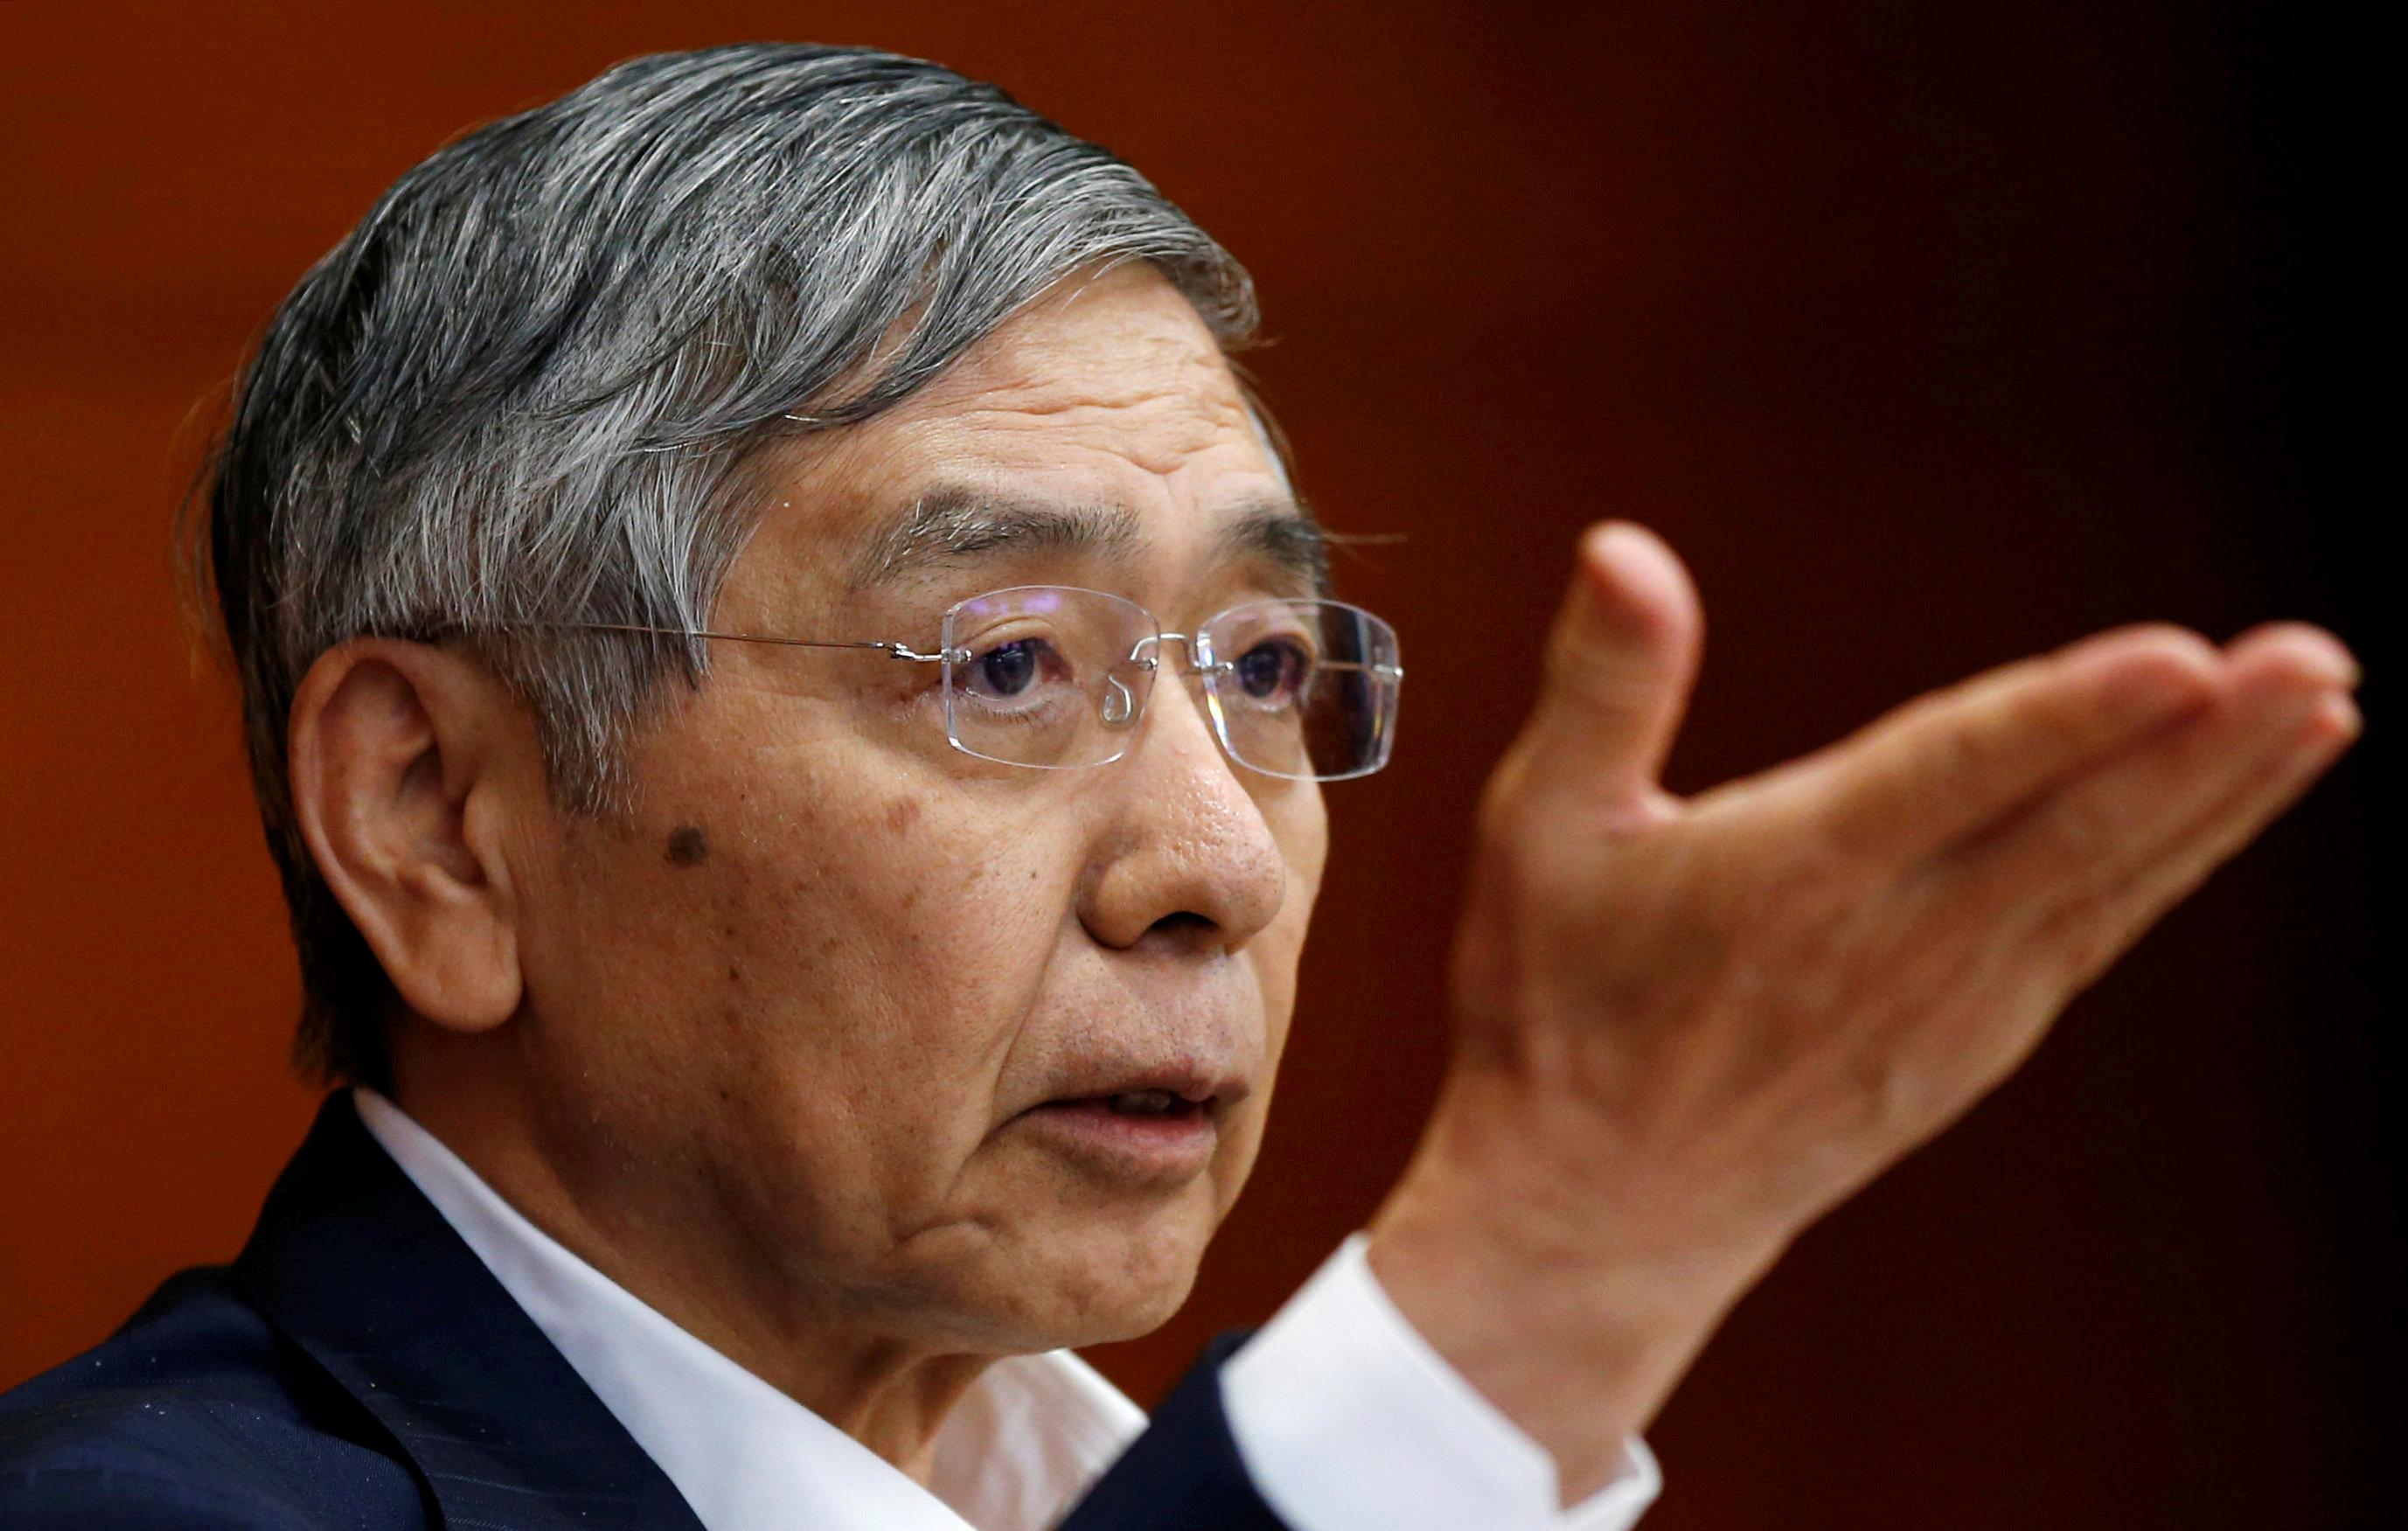 Bank of Japan's next challenge: Unwinding Kuroda's legacy stimulus